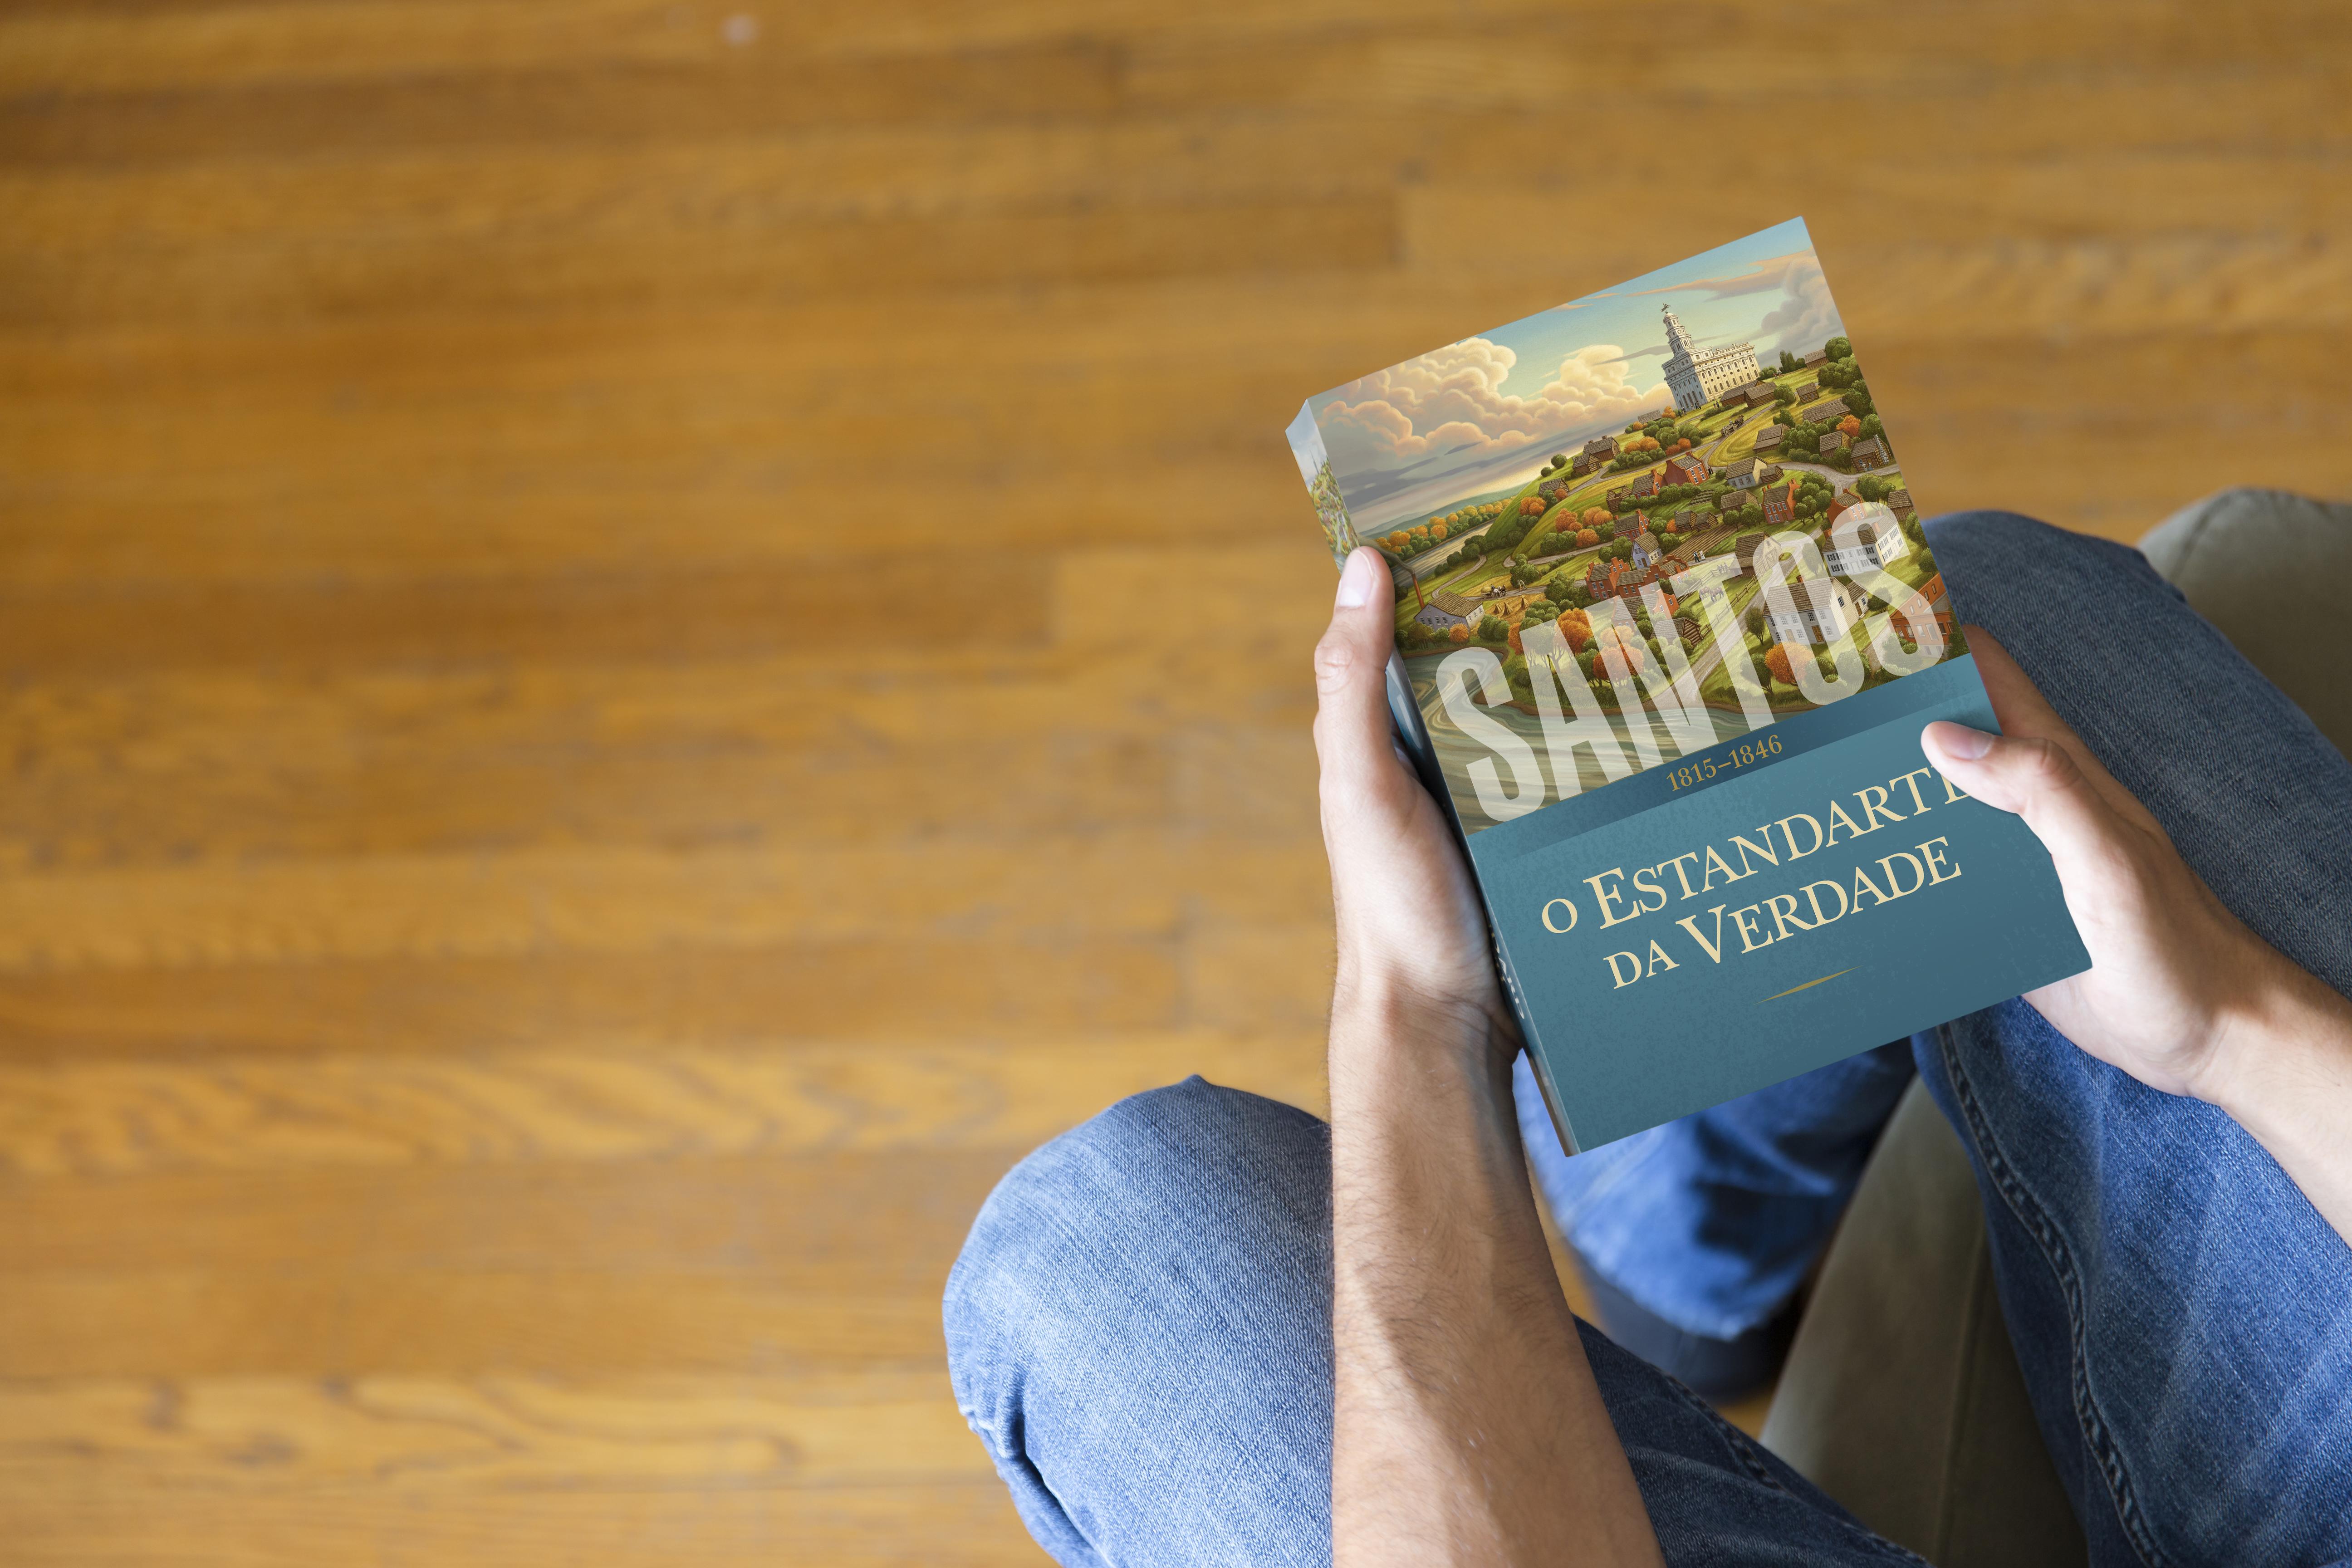 Santos, Volume 1